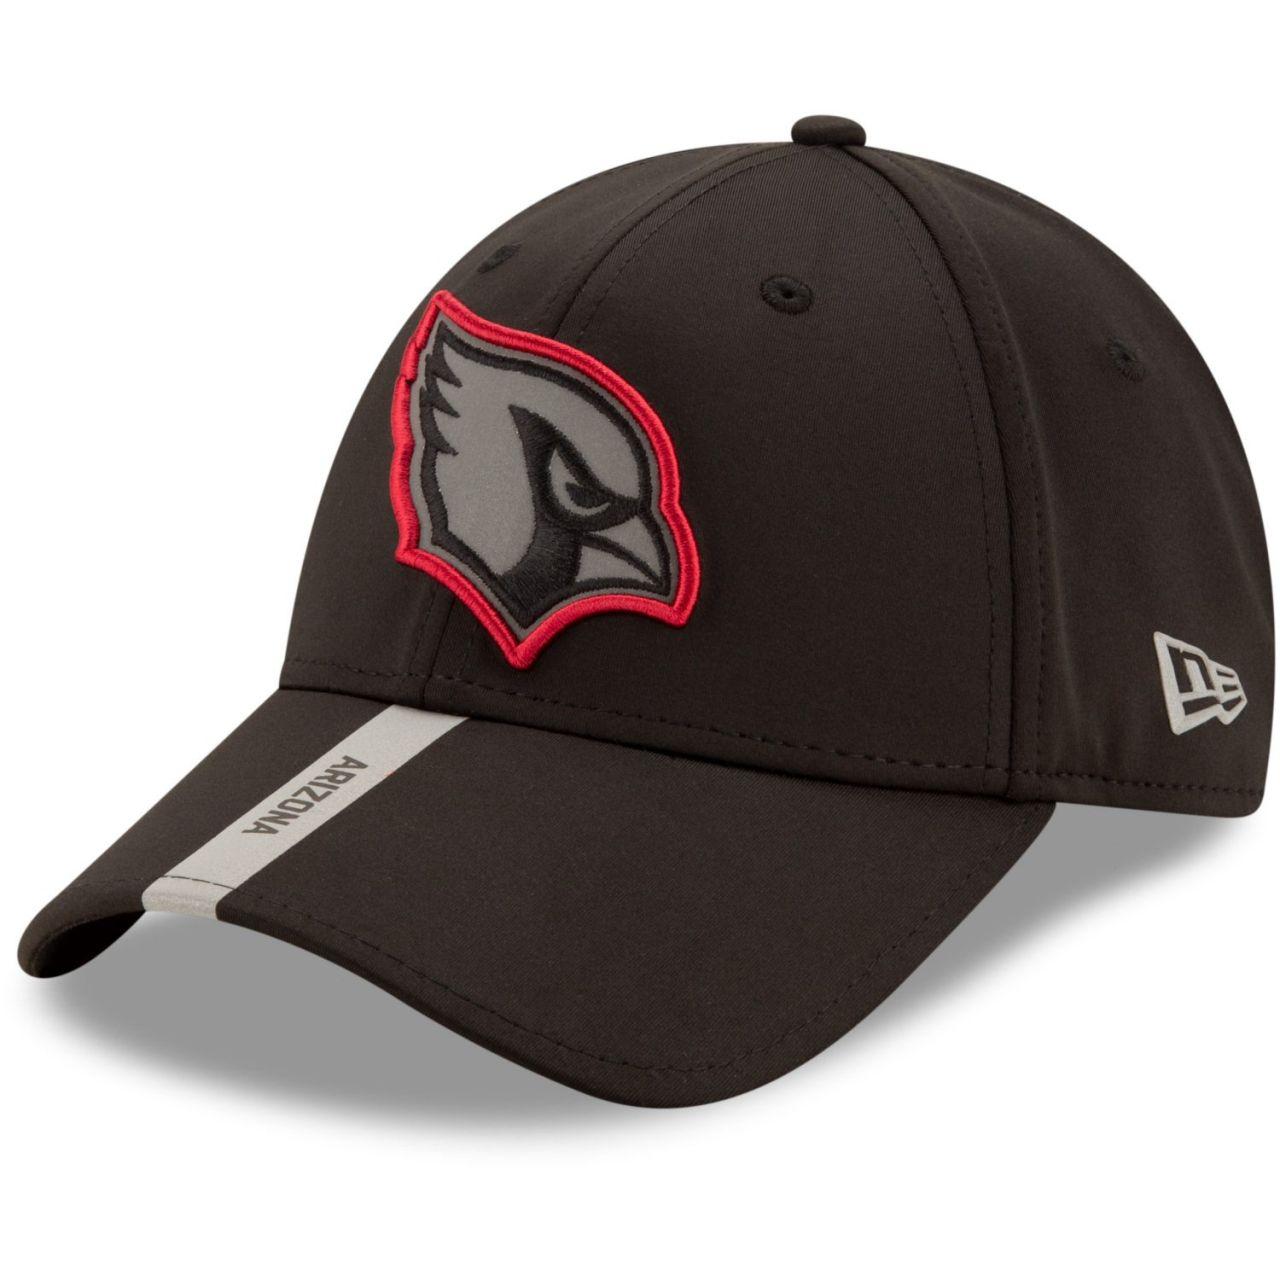 amfoo - New Era 9FORTY Stretch Snap Cap - COMBINE Arizona Cardinals